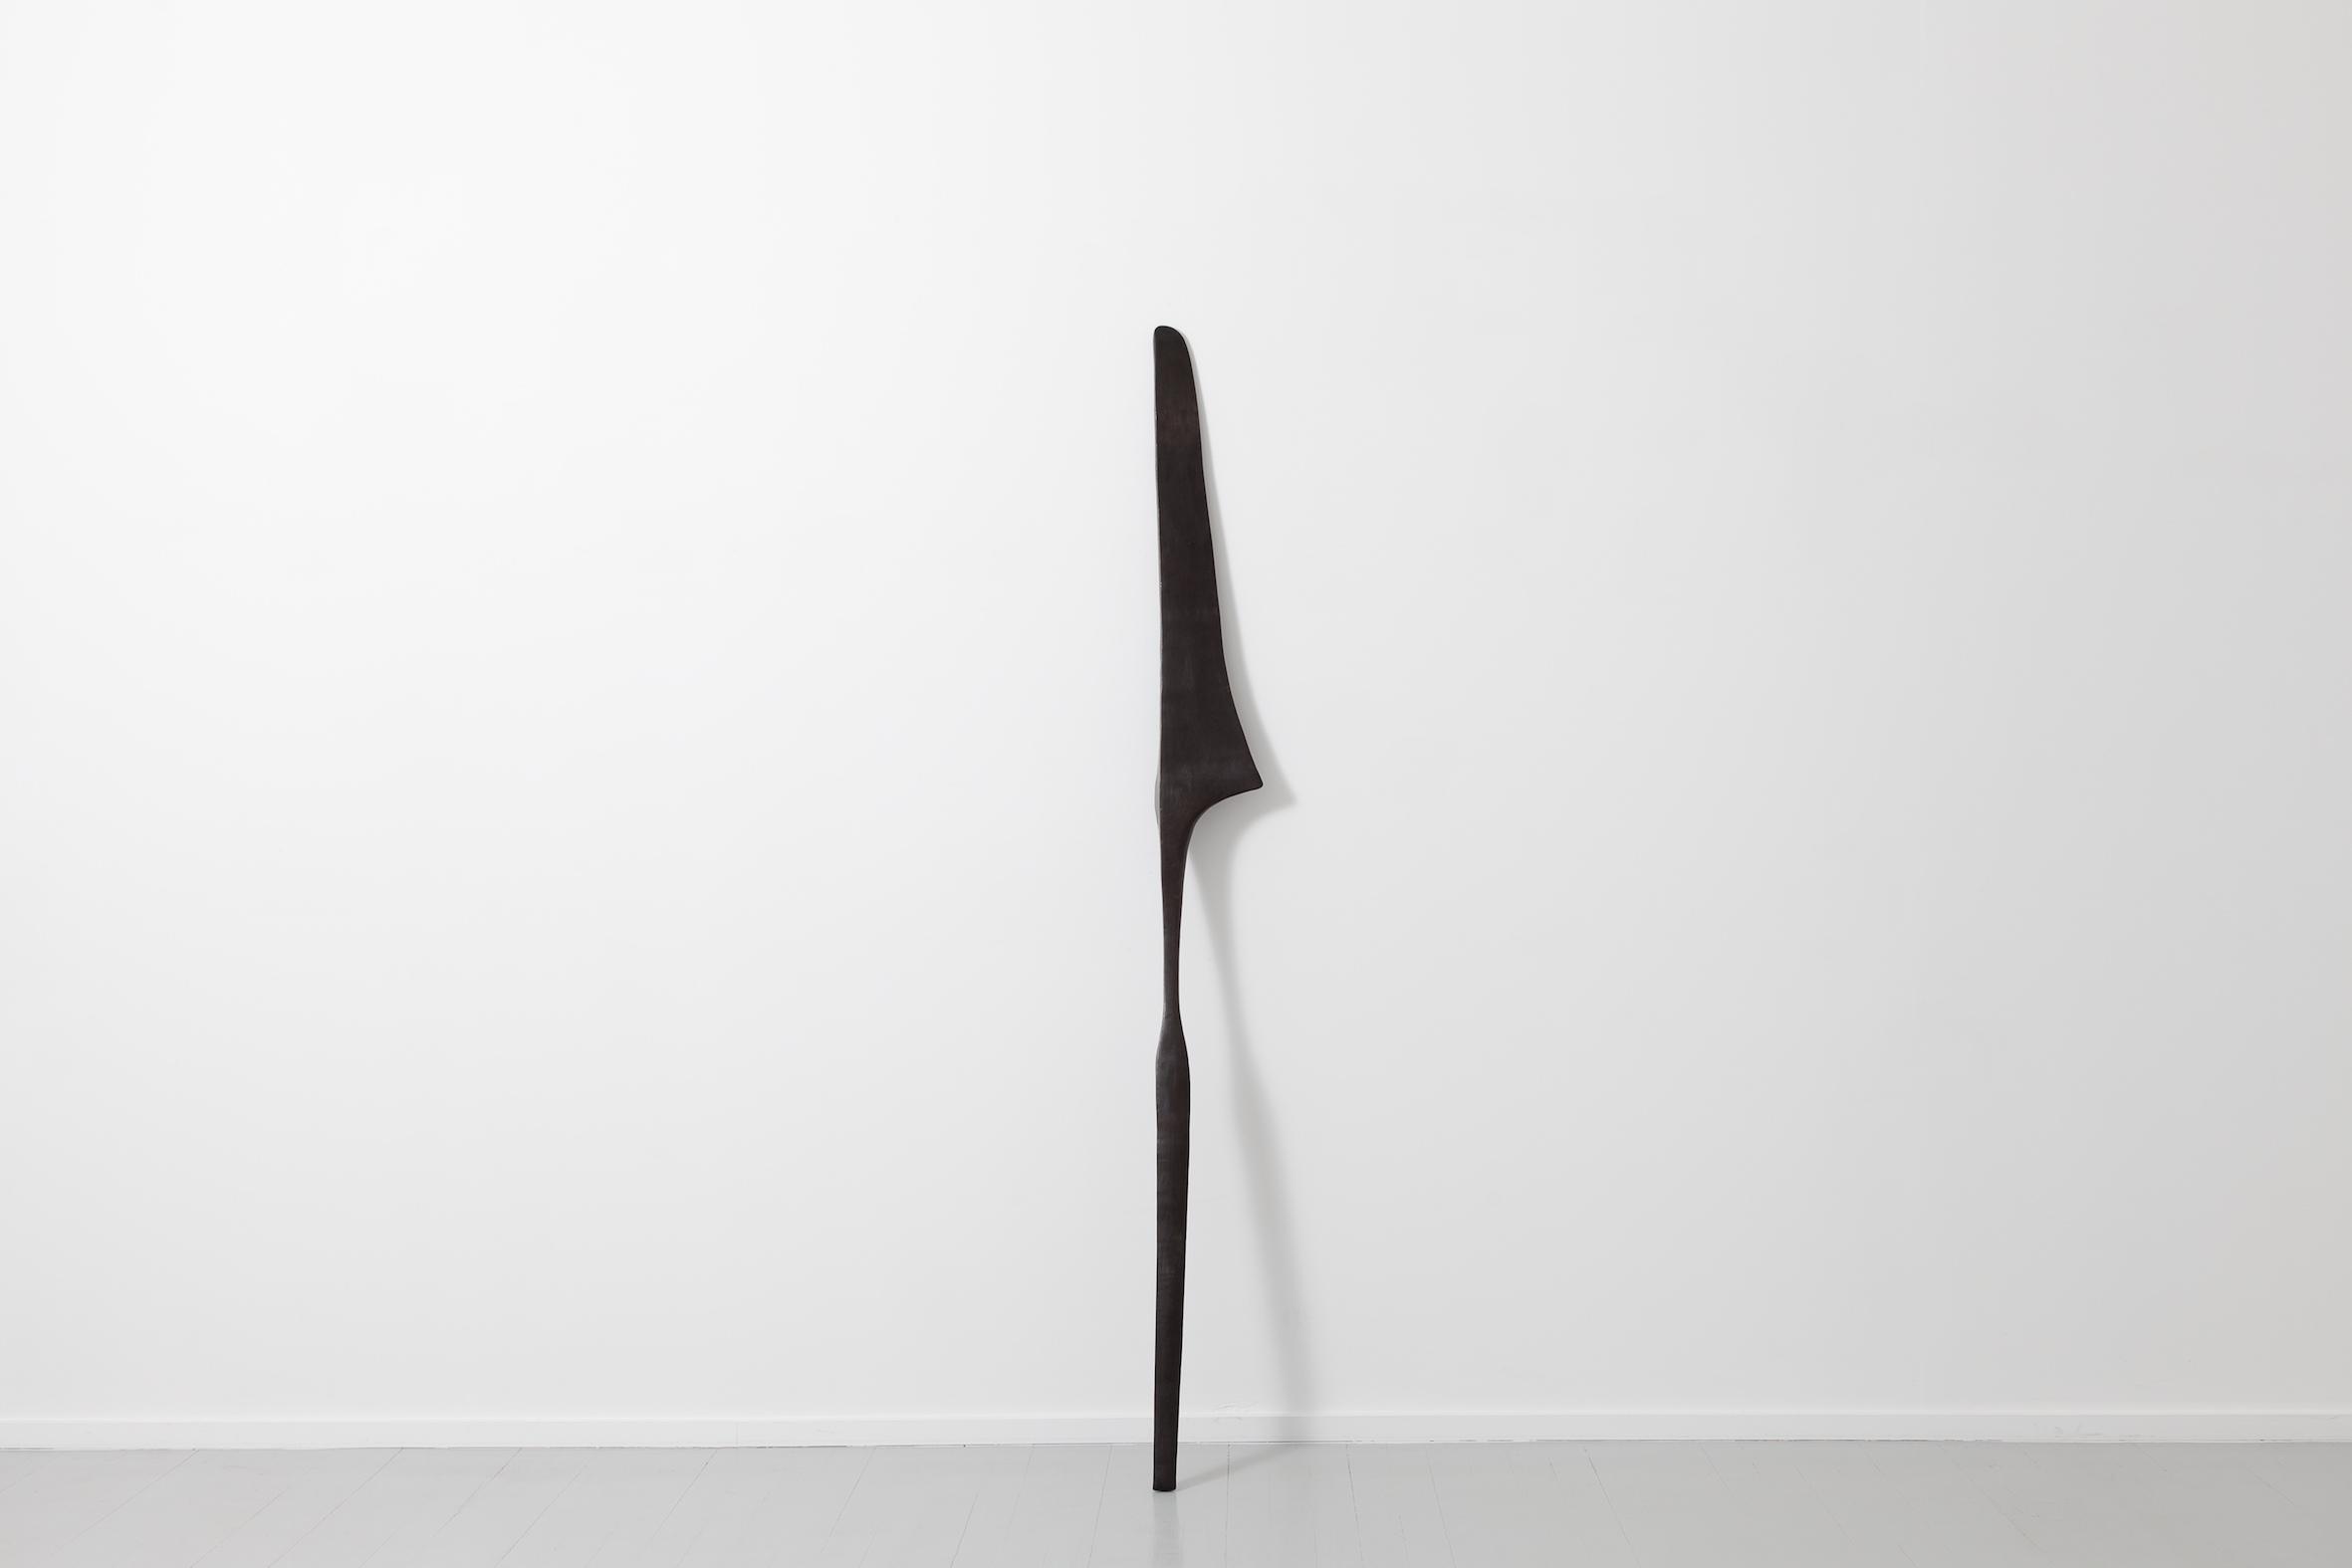 Sculpture VIII, 2017, patinated bronze, 195h x 19w x 30d cm